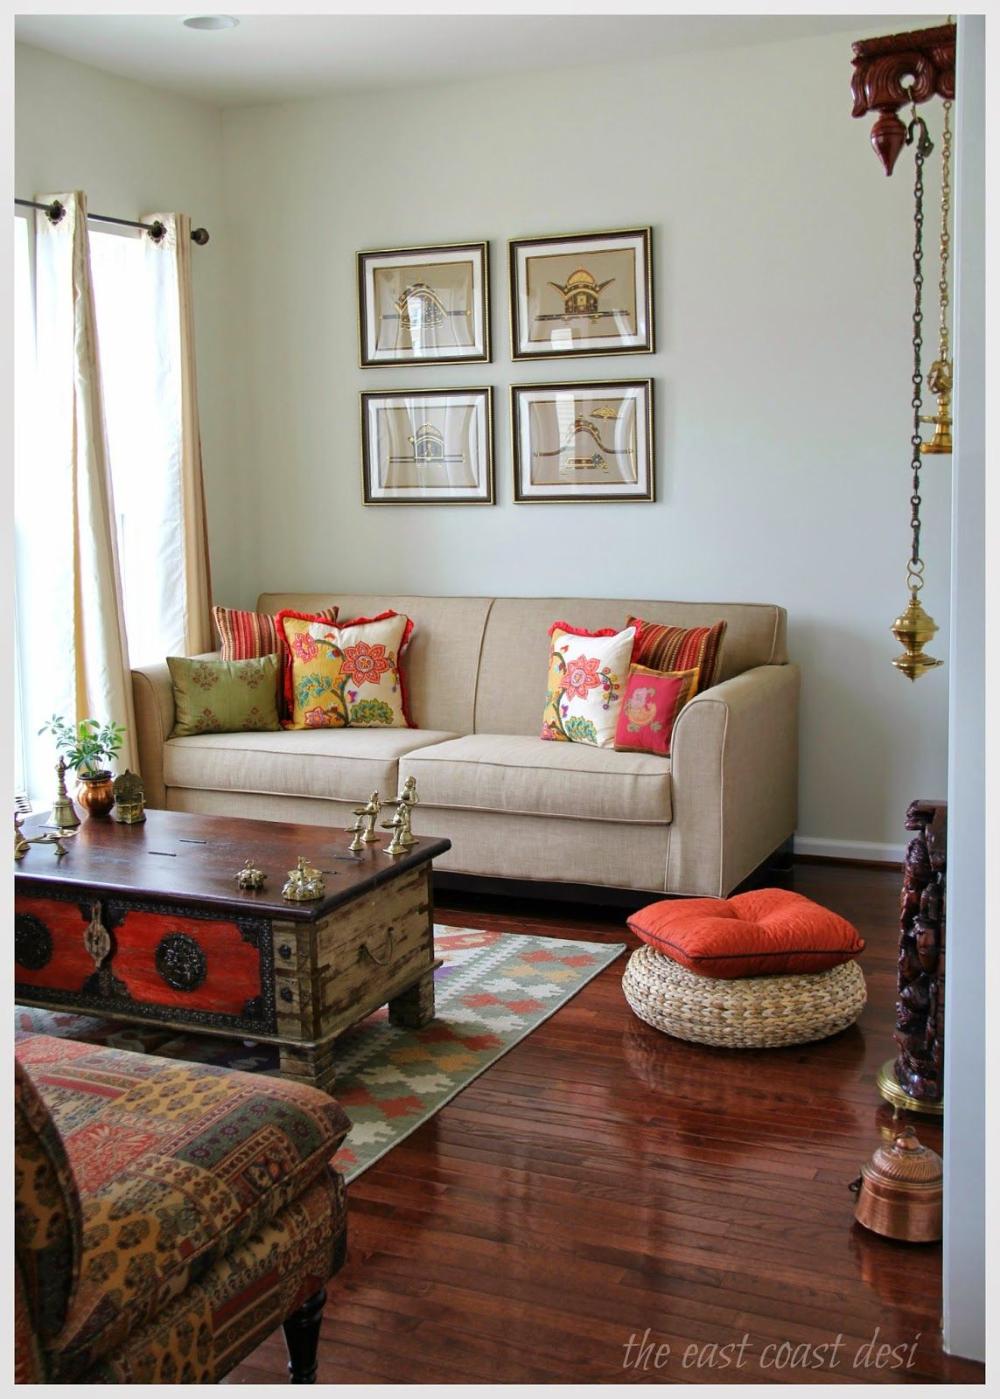 Blog About Home Interior Living Room Design Bathroom Design Kitchen Design Dining Room Design Ga Indian Home Design Indian Interior Design Indian Home Interior